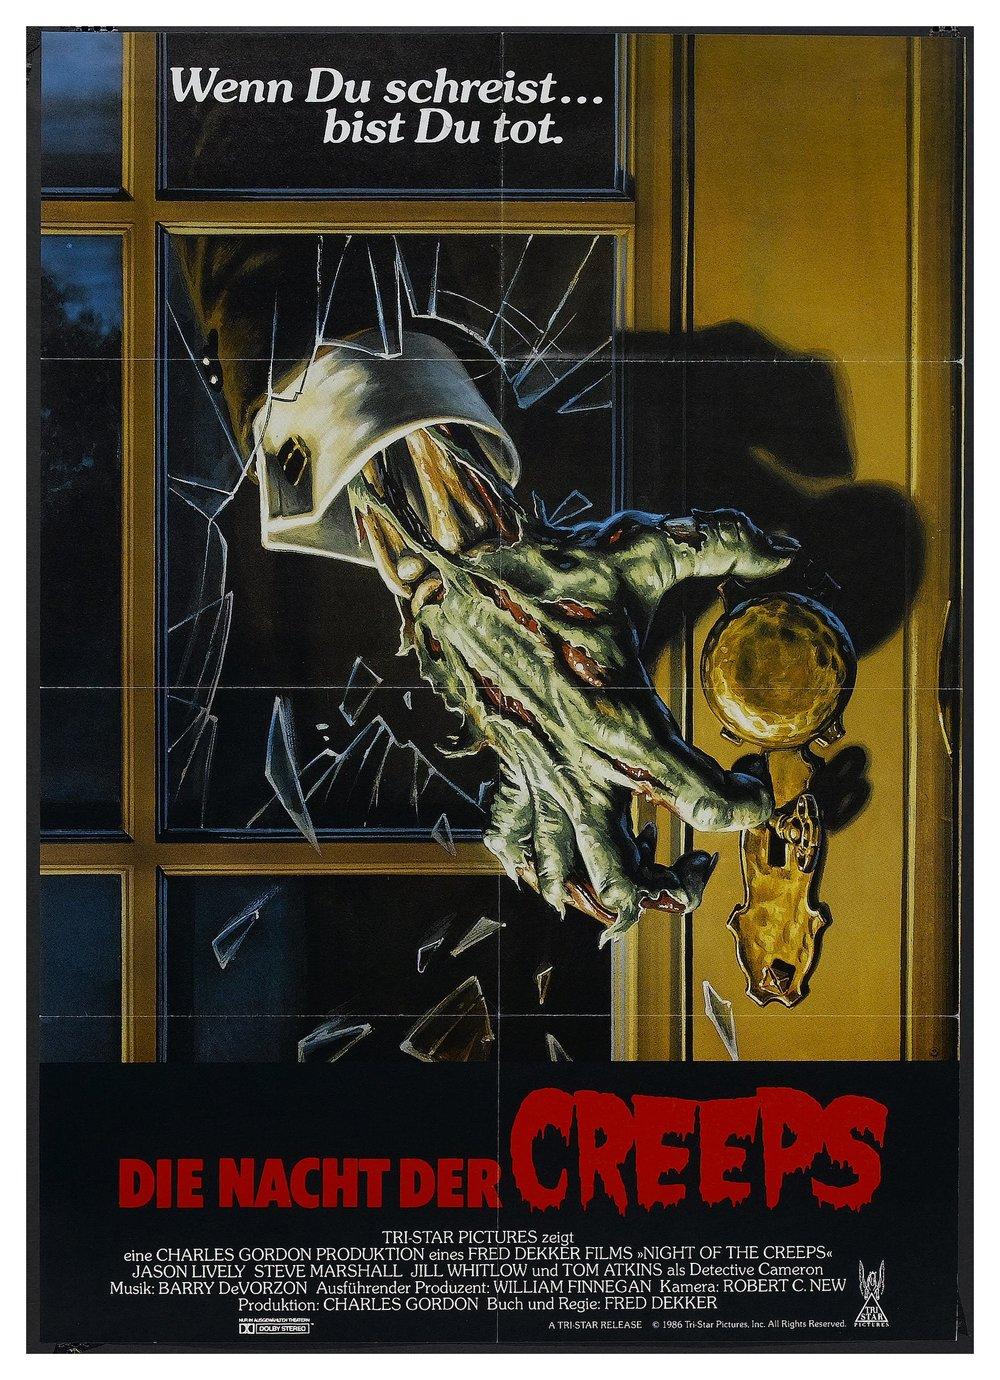 night_of_the_creeps_poster_01.jpg